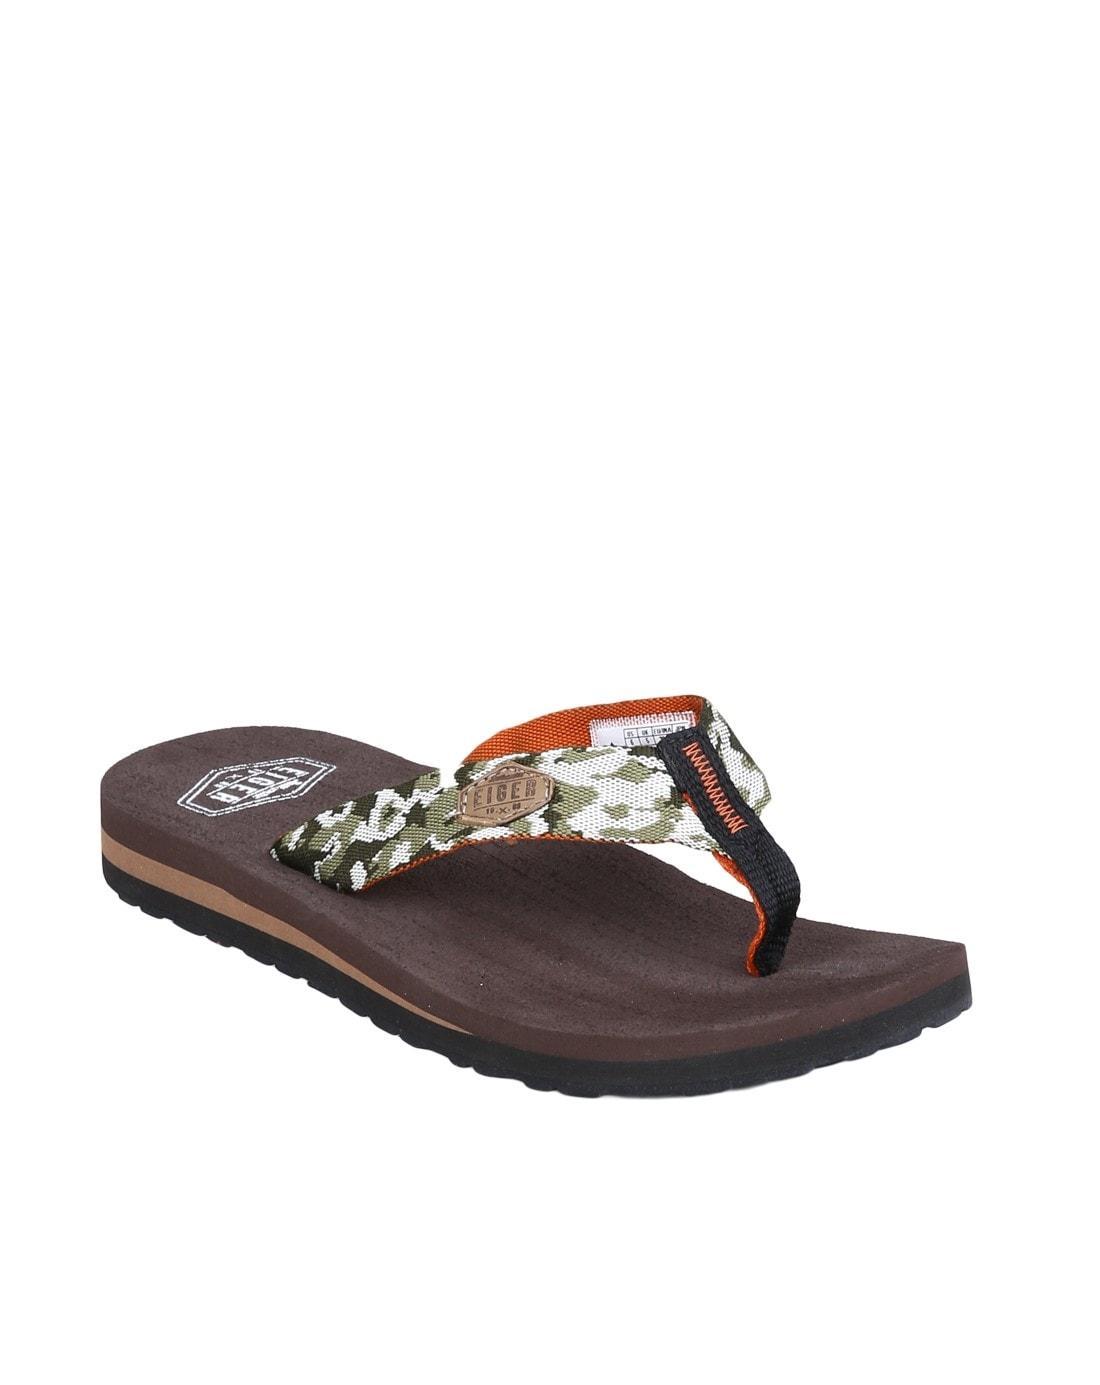 Sendal jepit/sandal gunung eiger cocok untuk hiking, camping,